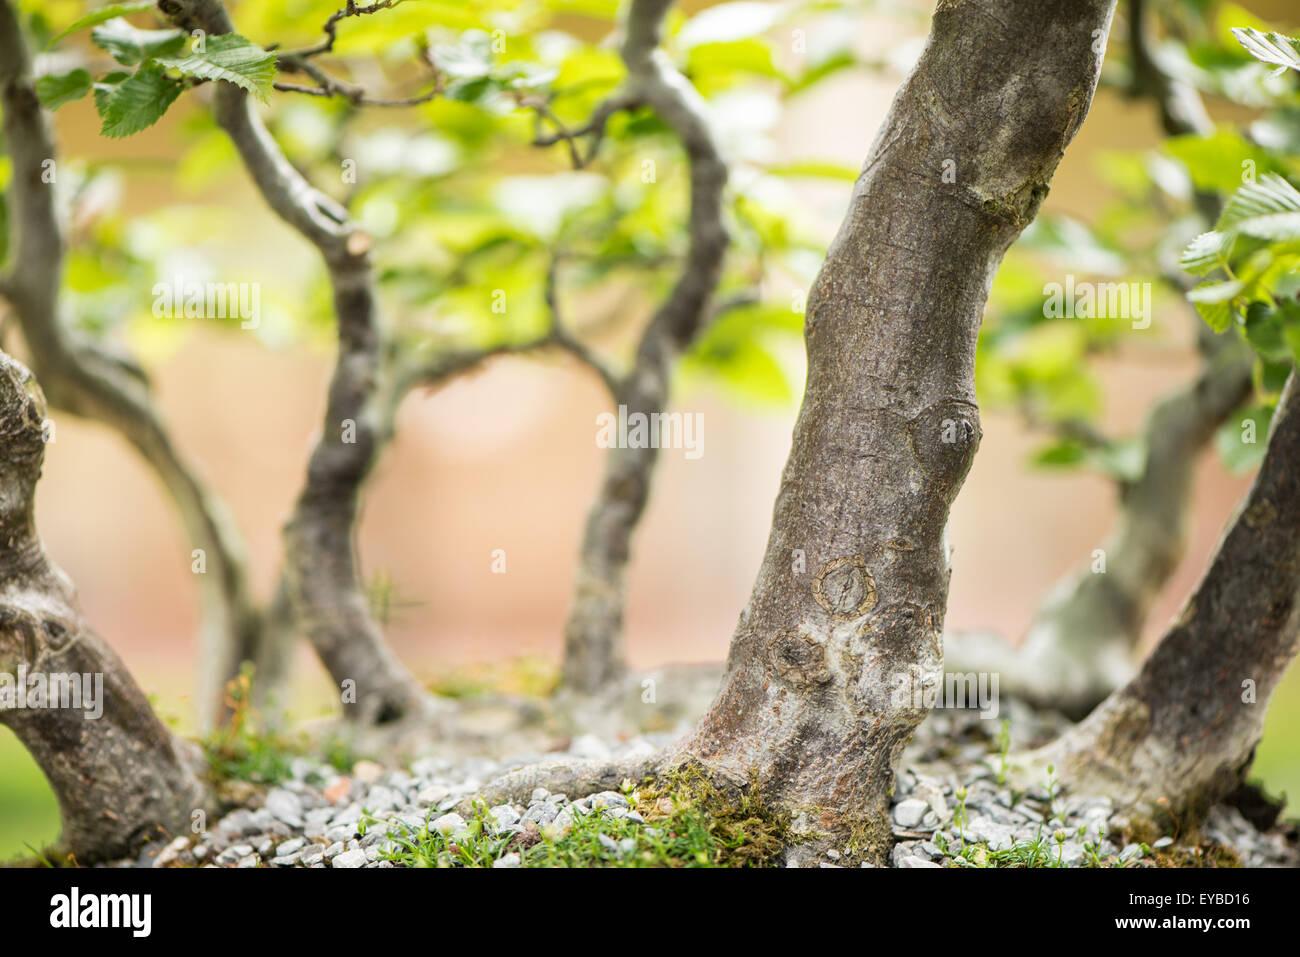 Bonsai forest with common hornbeams (Carpinus betulus) - Stock Image